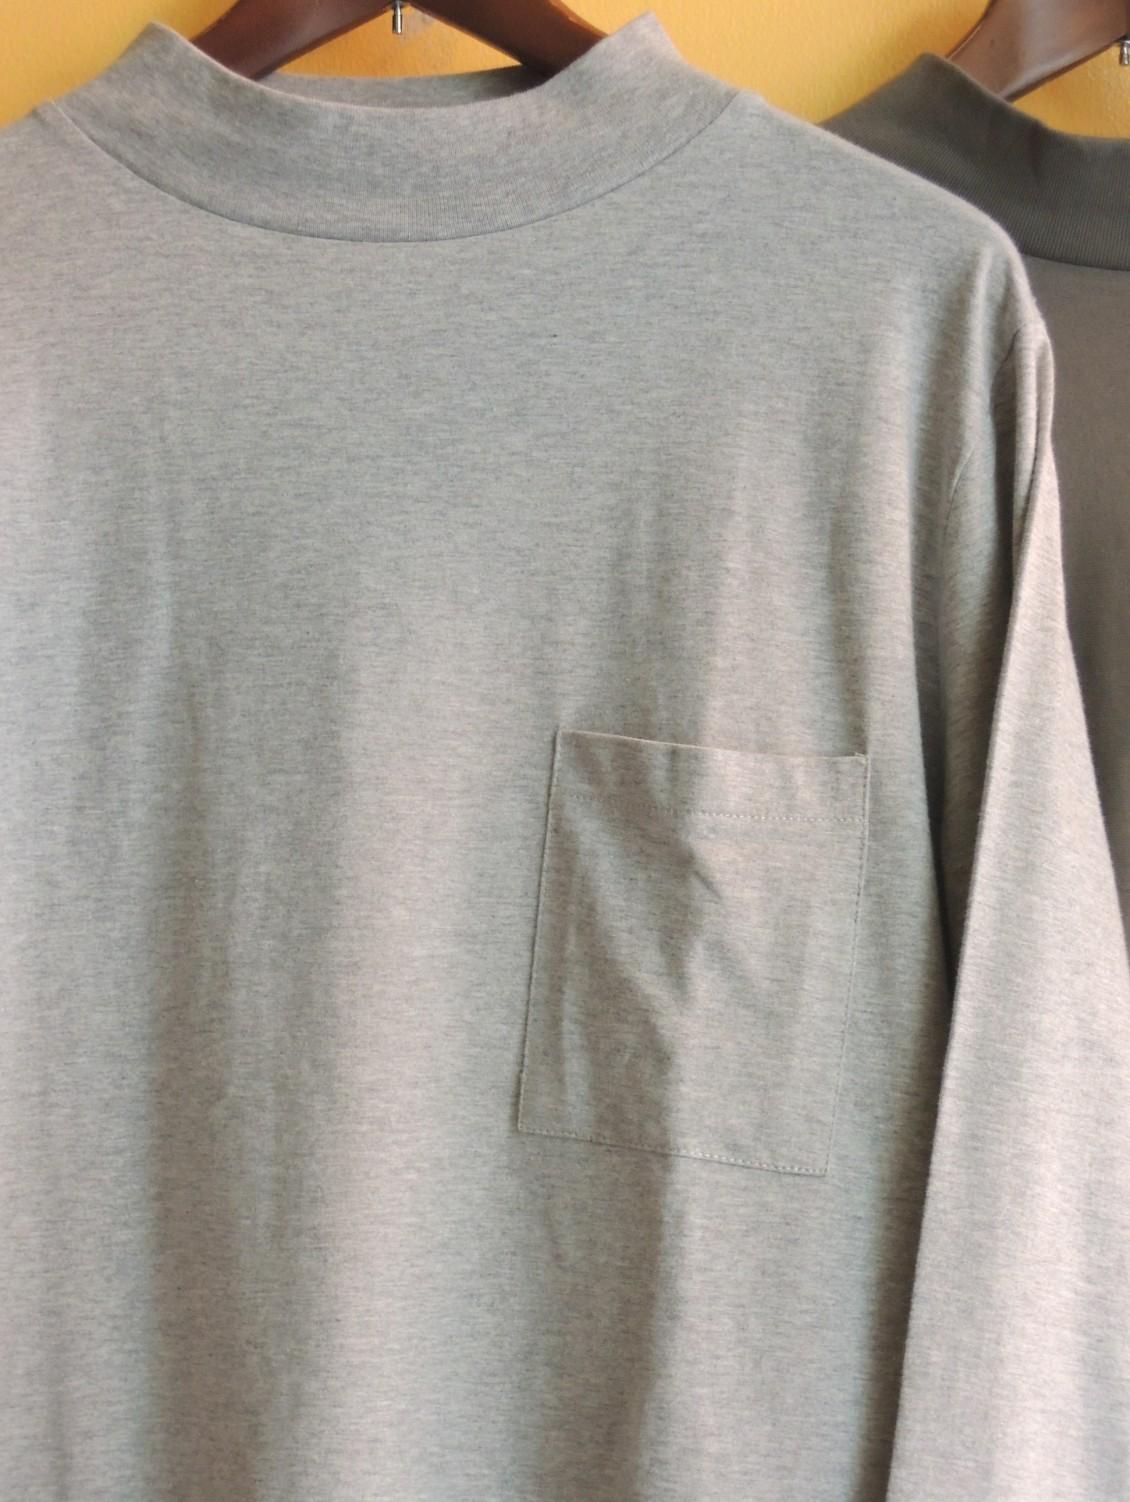 mockneckpockettshirts02.JPG